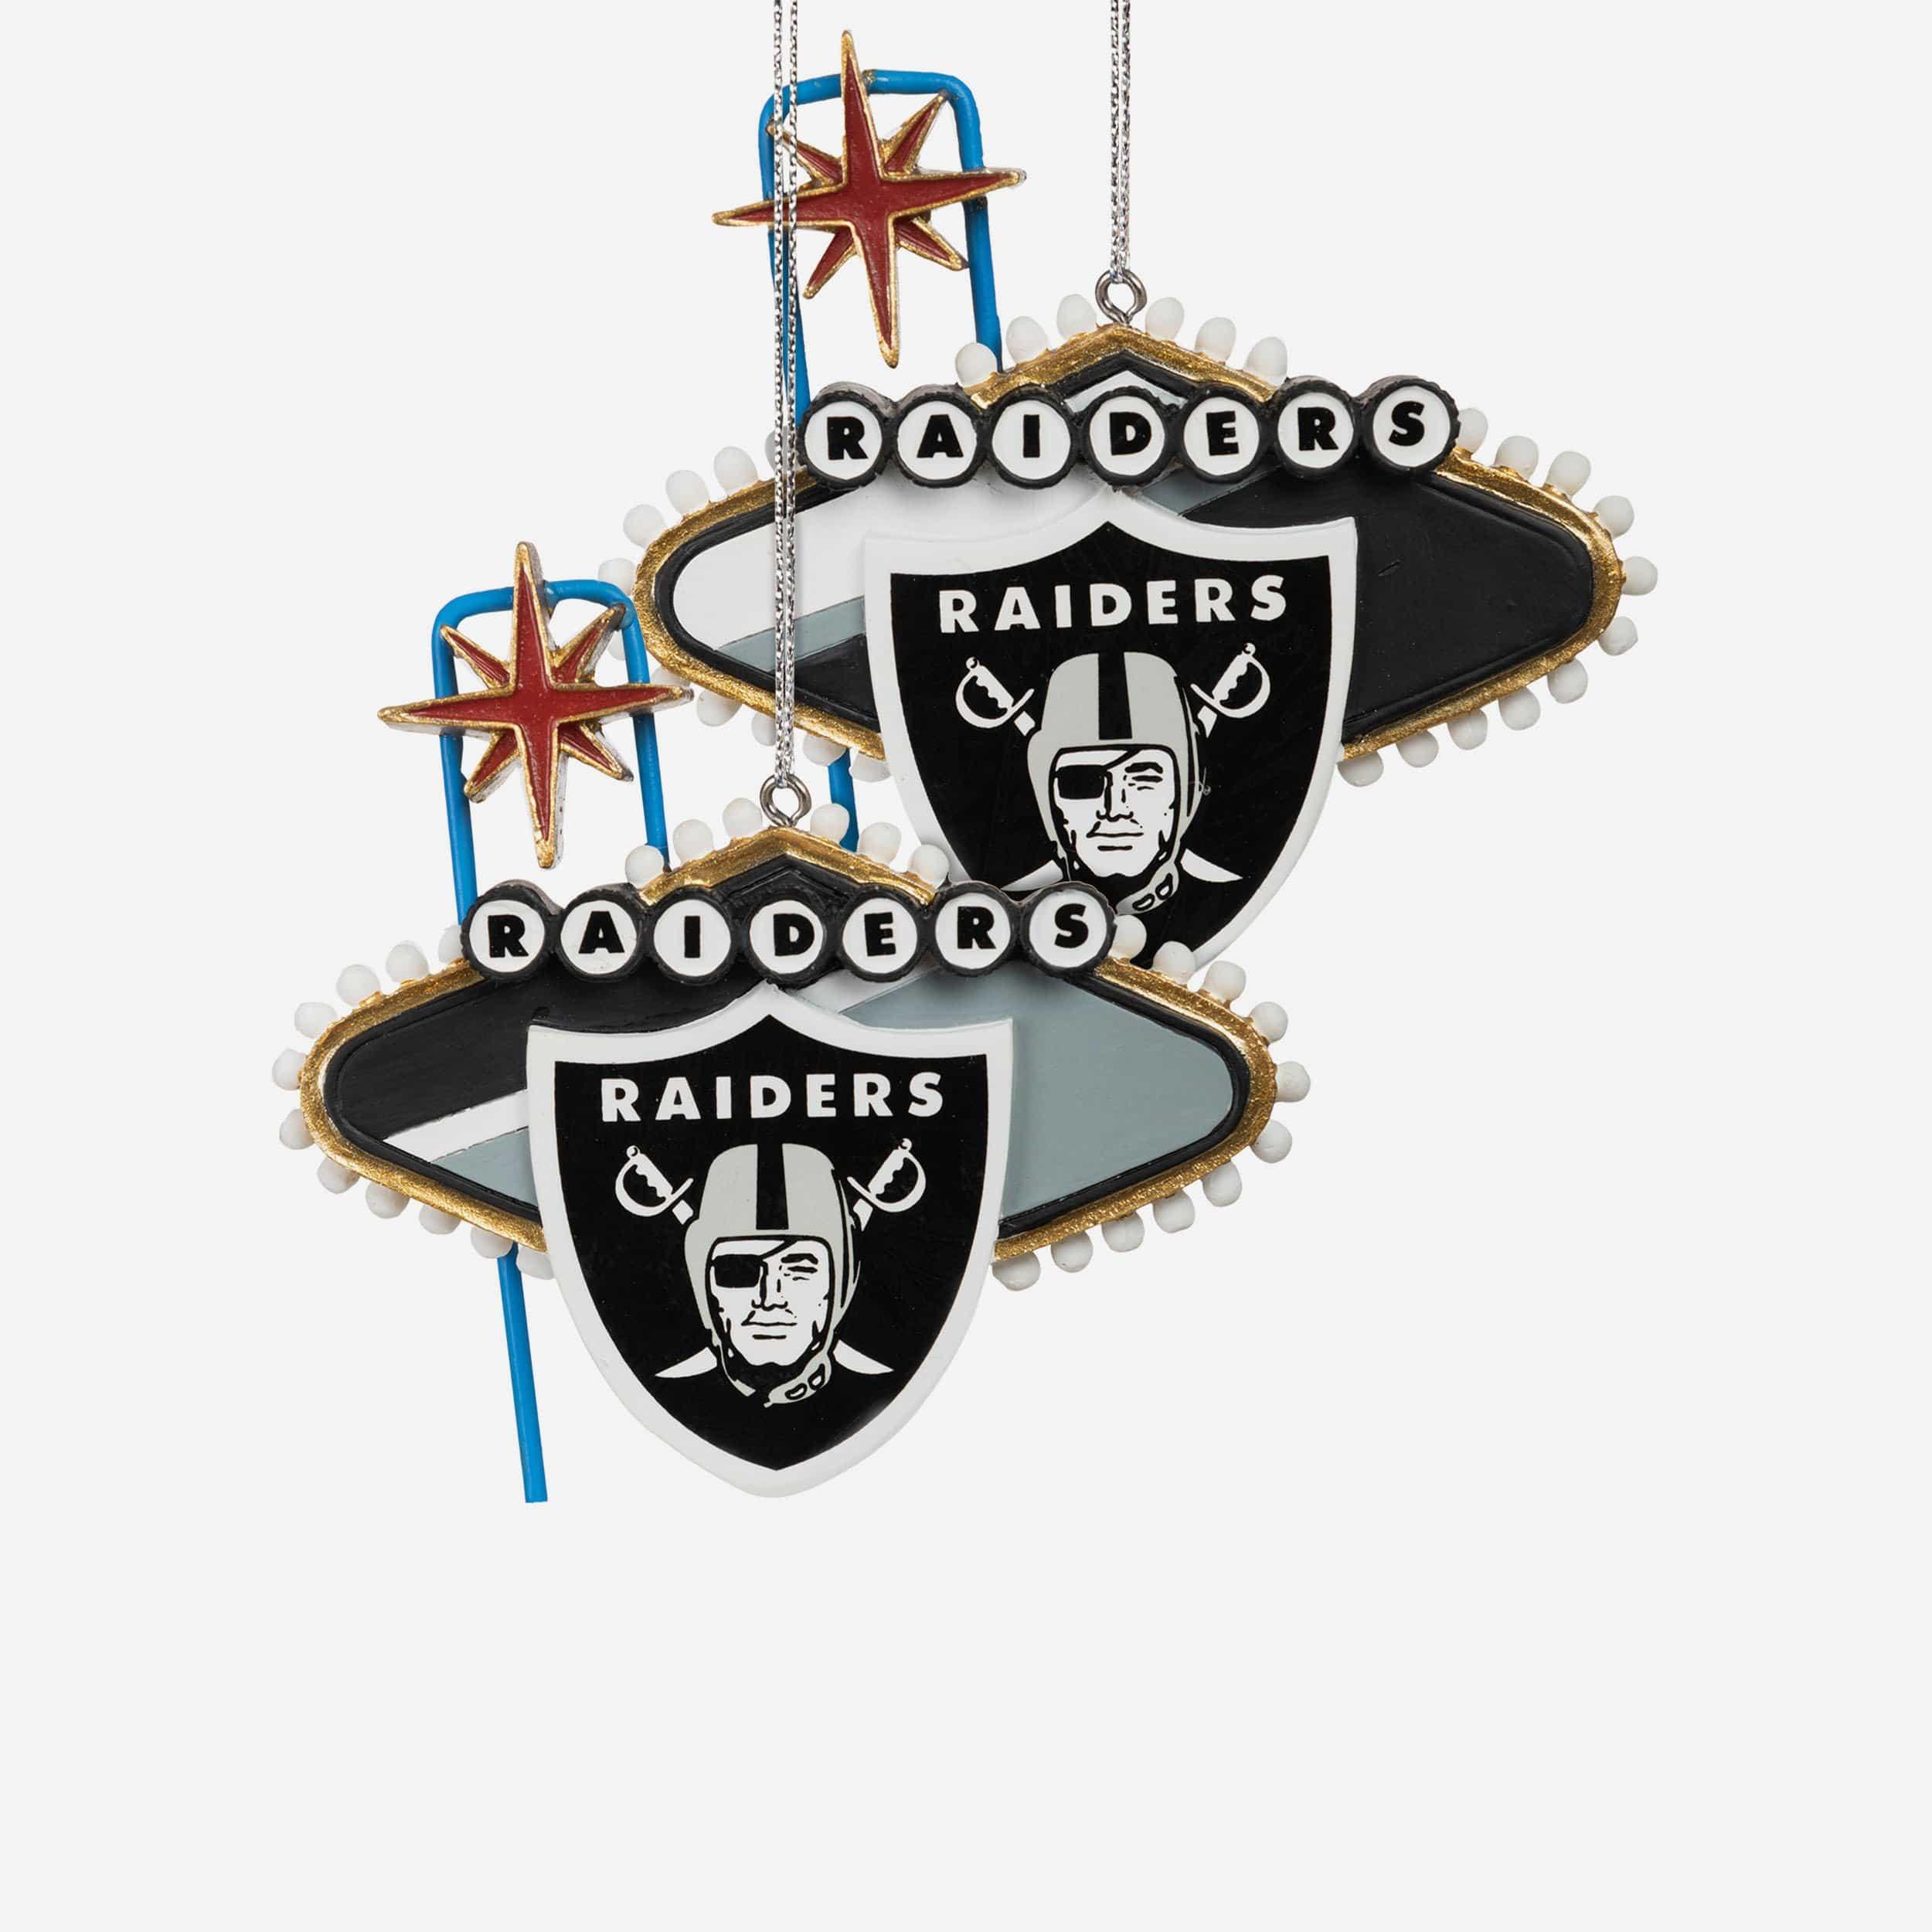 FOCO Las Vegas Raiders 2 Pack Thematic Ornament Set